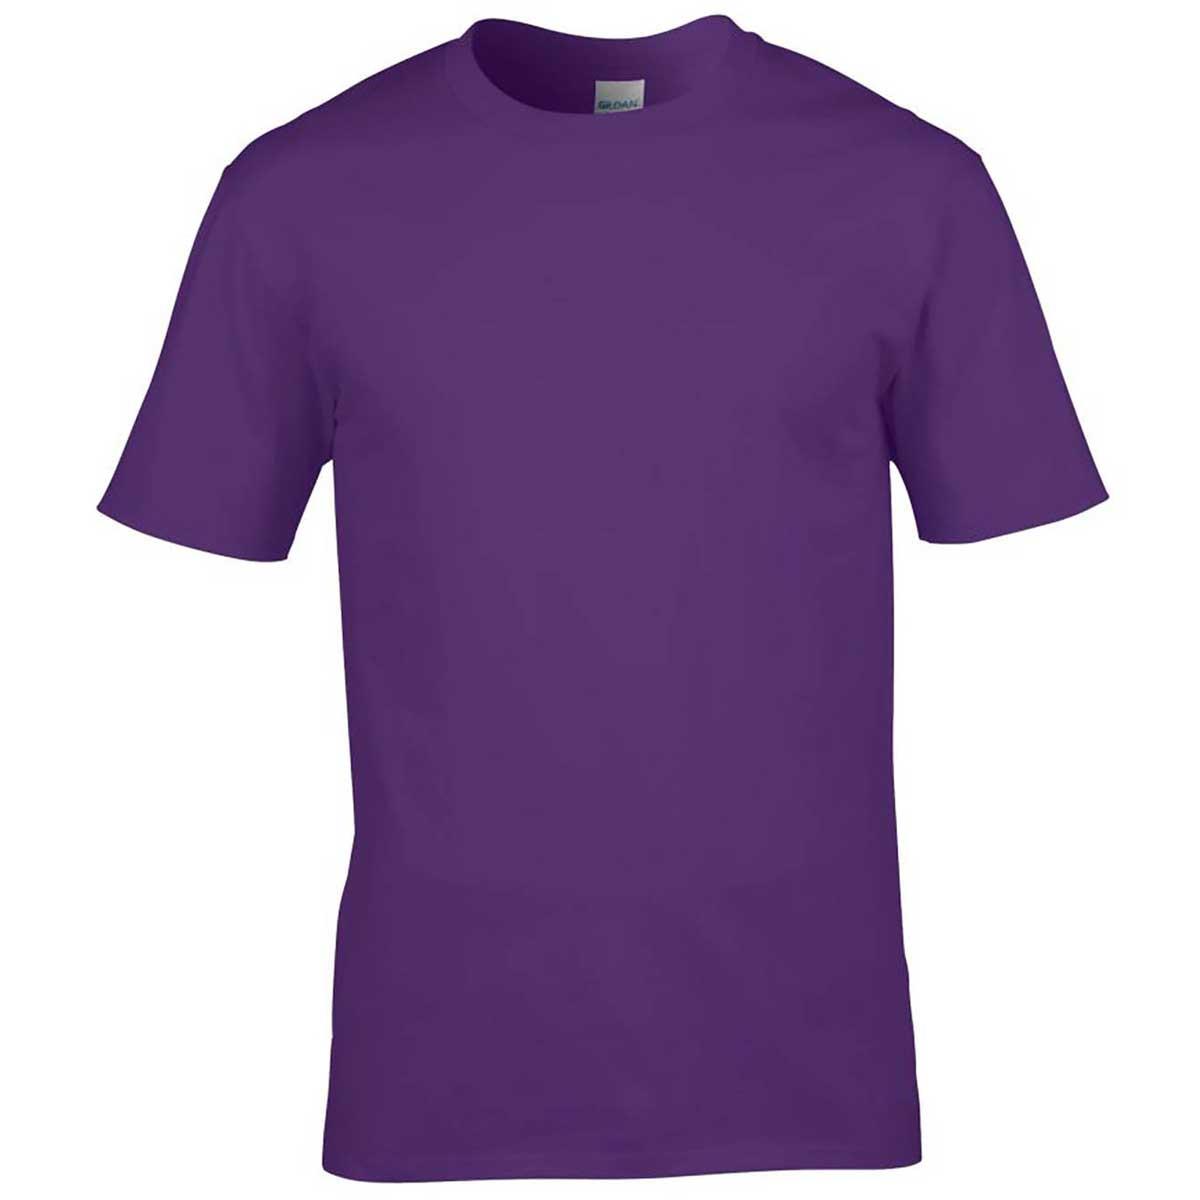 01_gd008_2_violet--0-0--35c80708-bef8-4951-83f1-c4692a3105cf